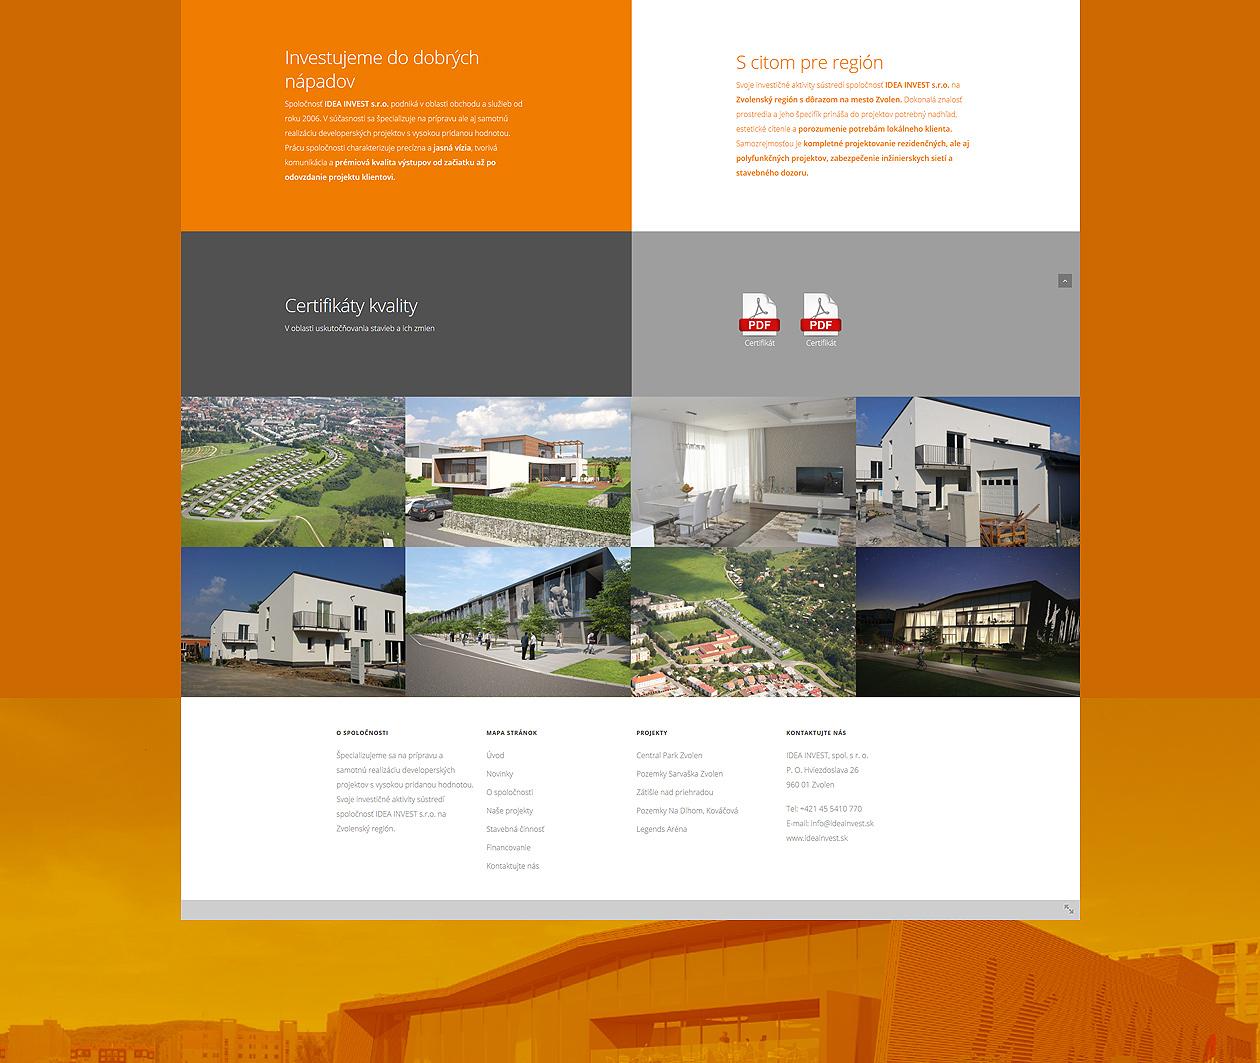 webdesign-logo-branding-idea-invest-04